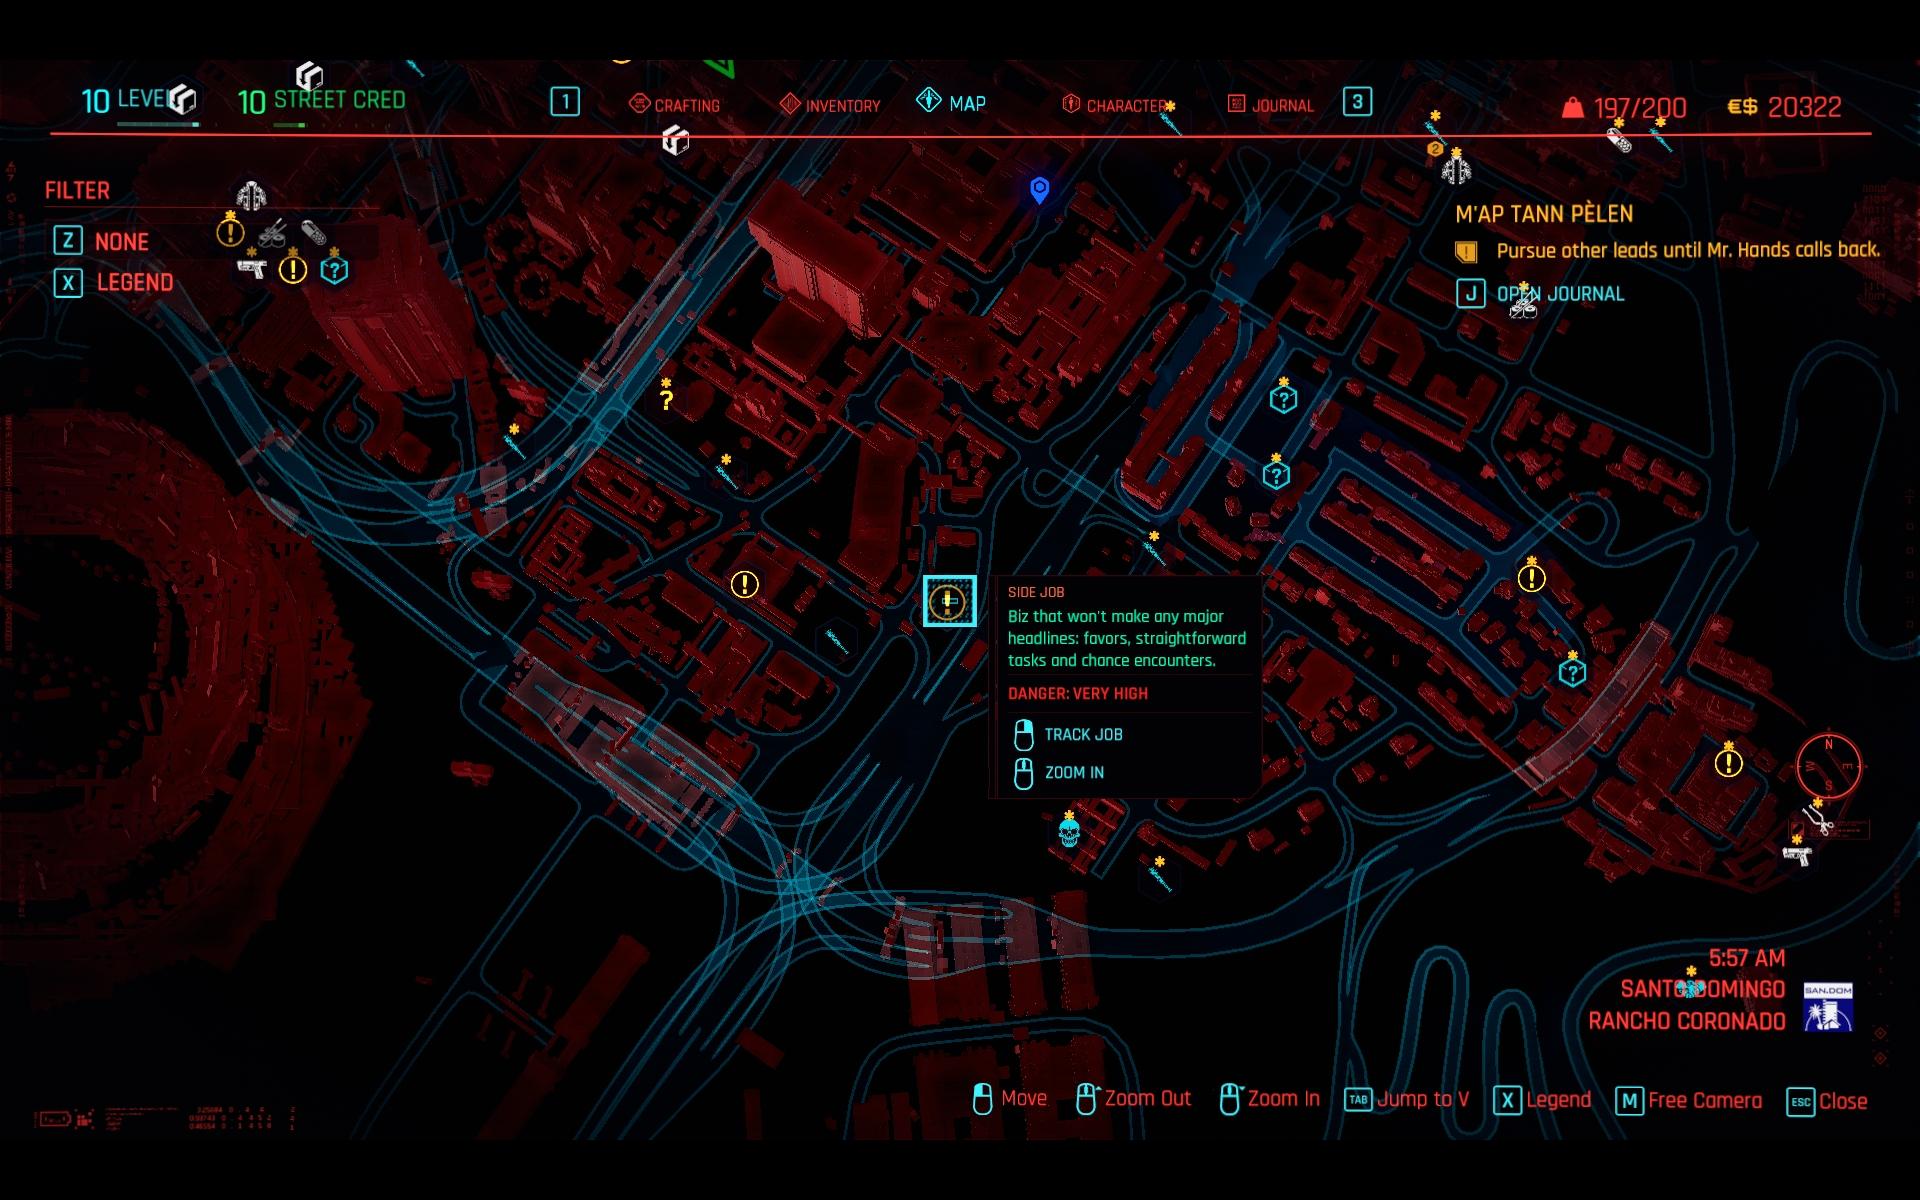 Cyberpunk 2077 Money and Legendary Items Glitch